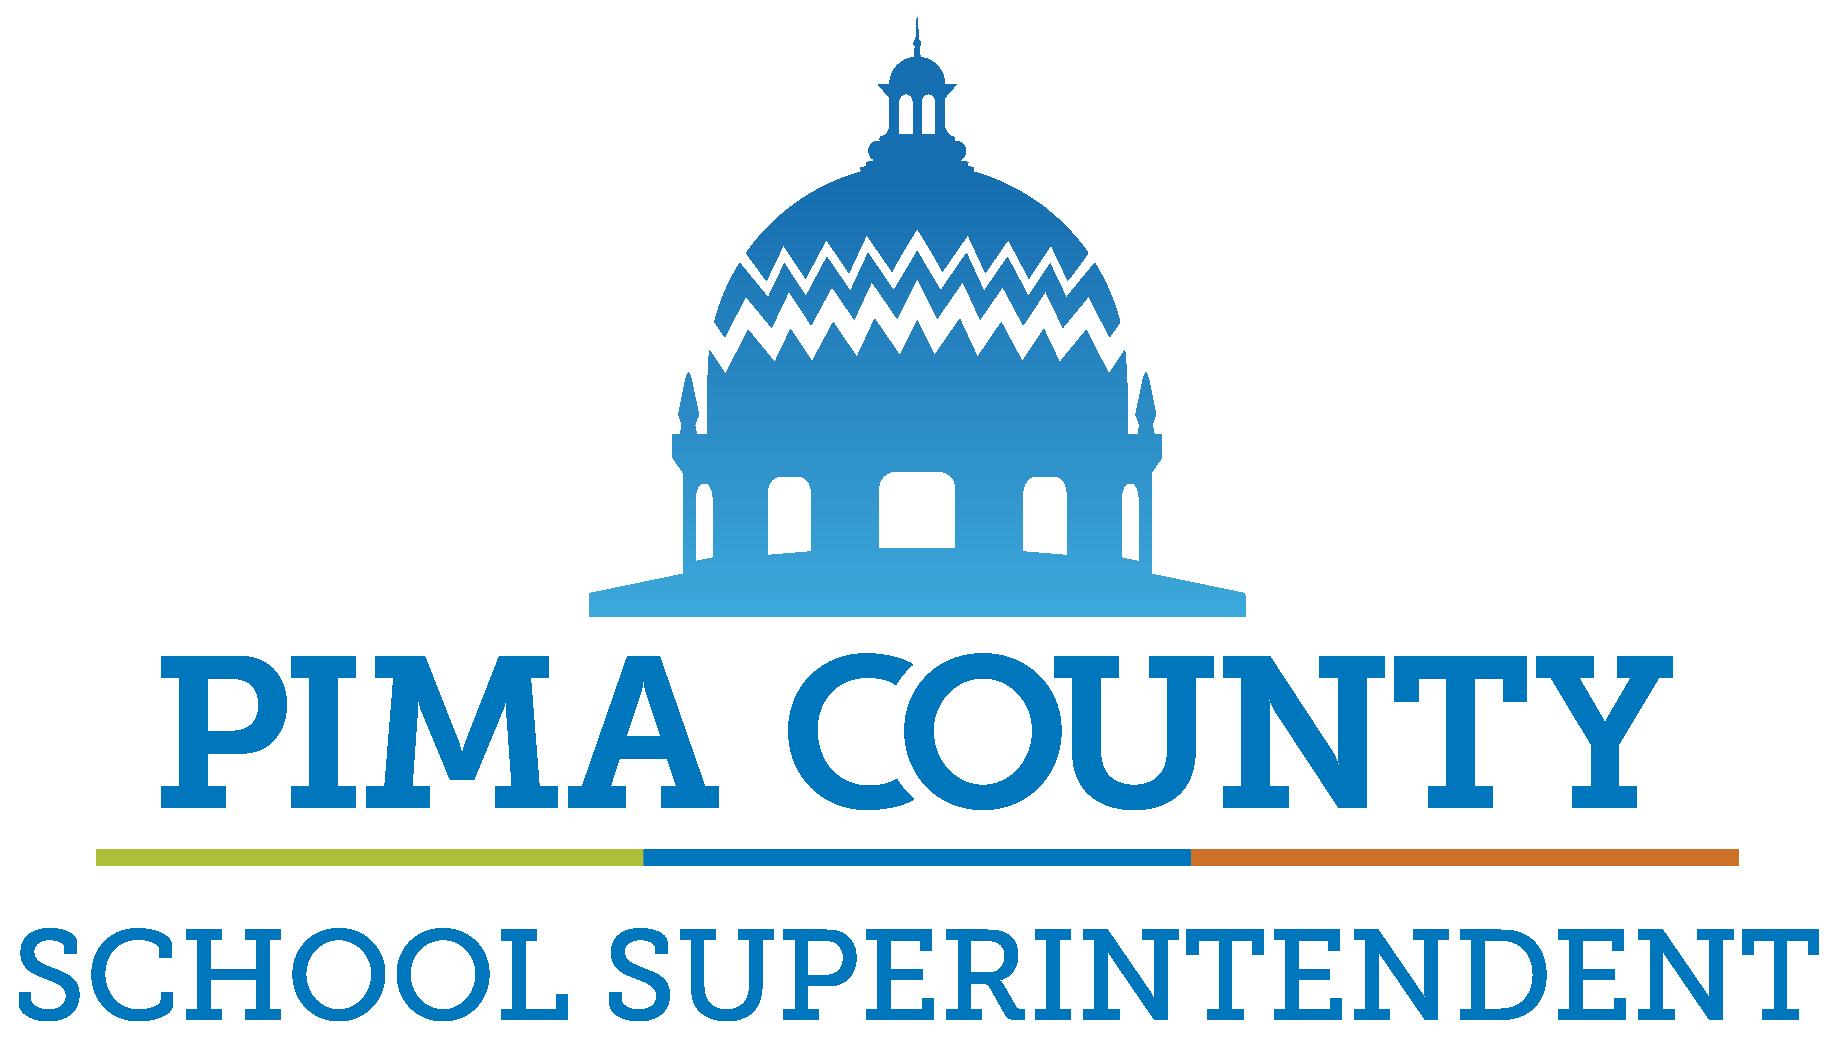 Pima County School Superintendent's Office